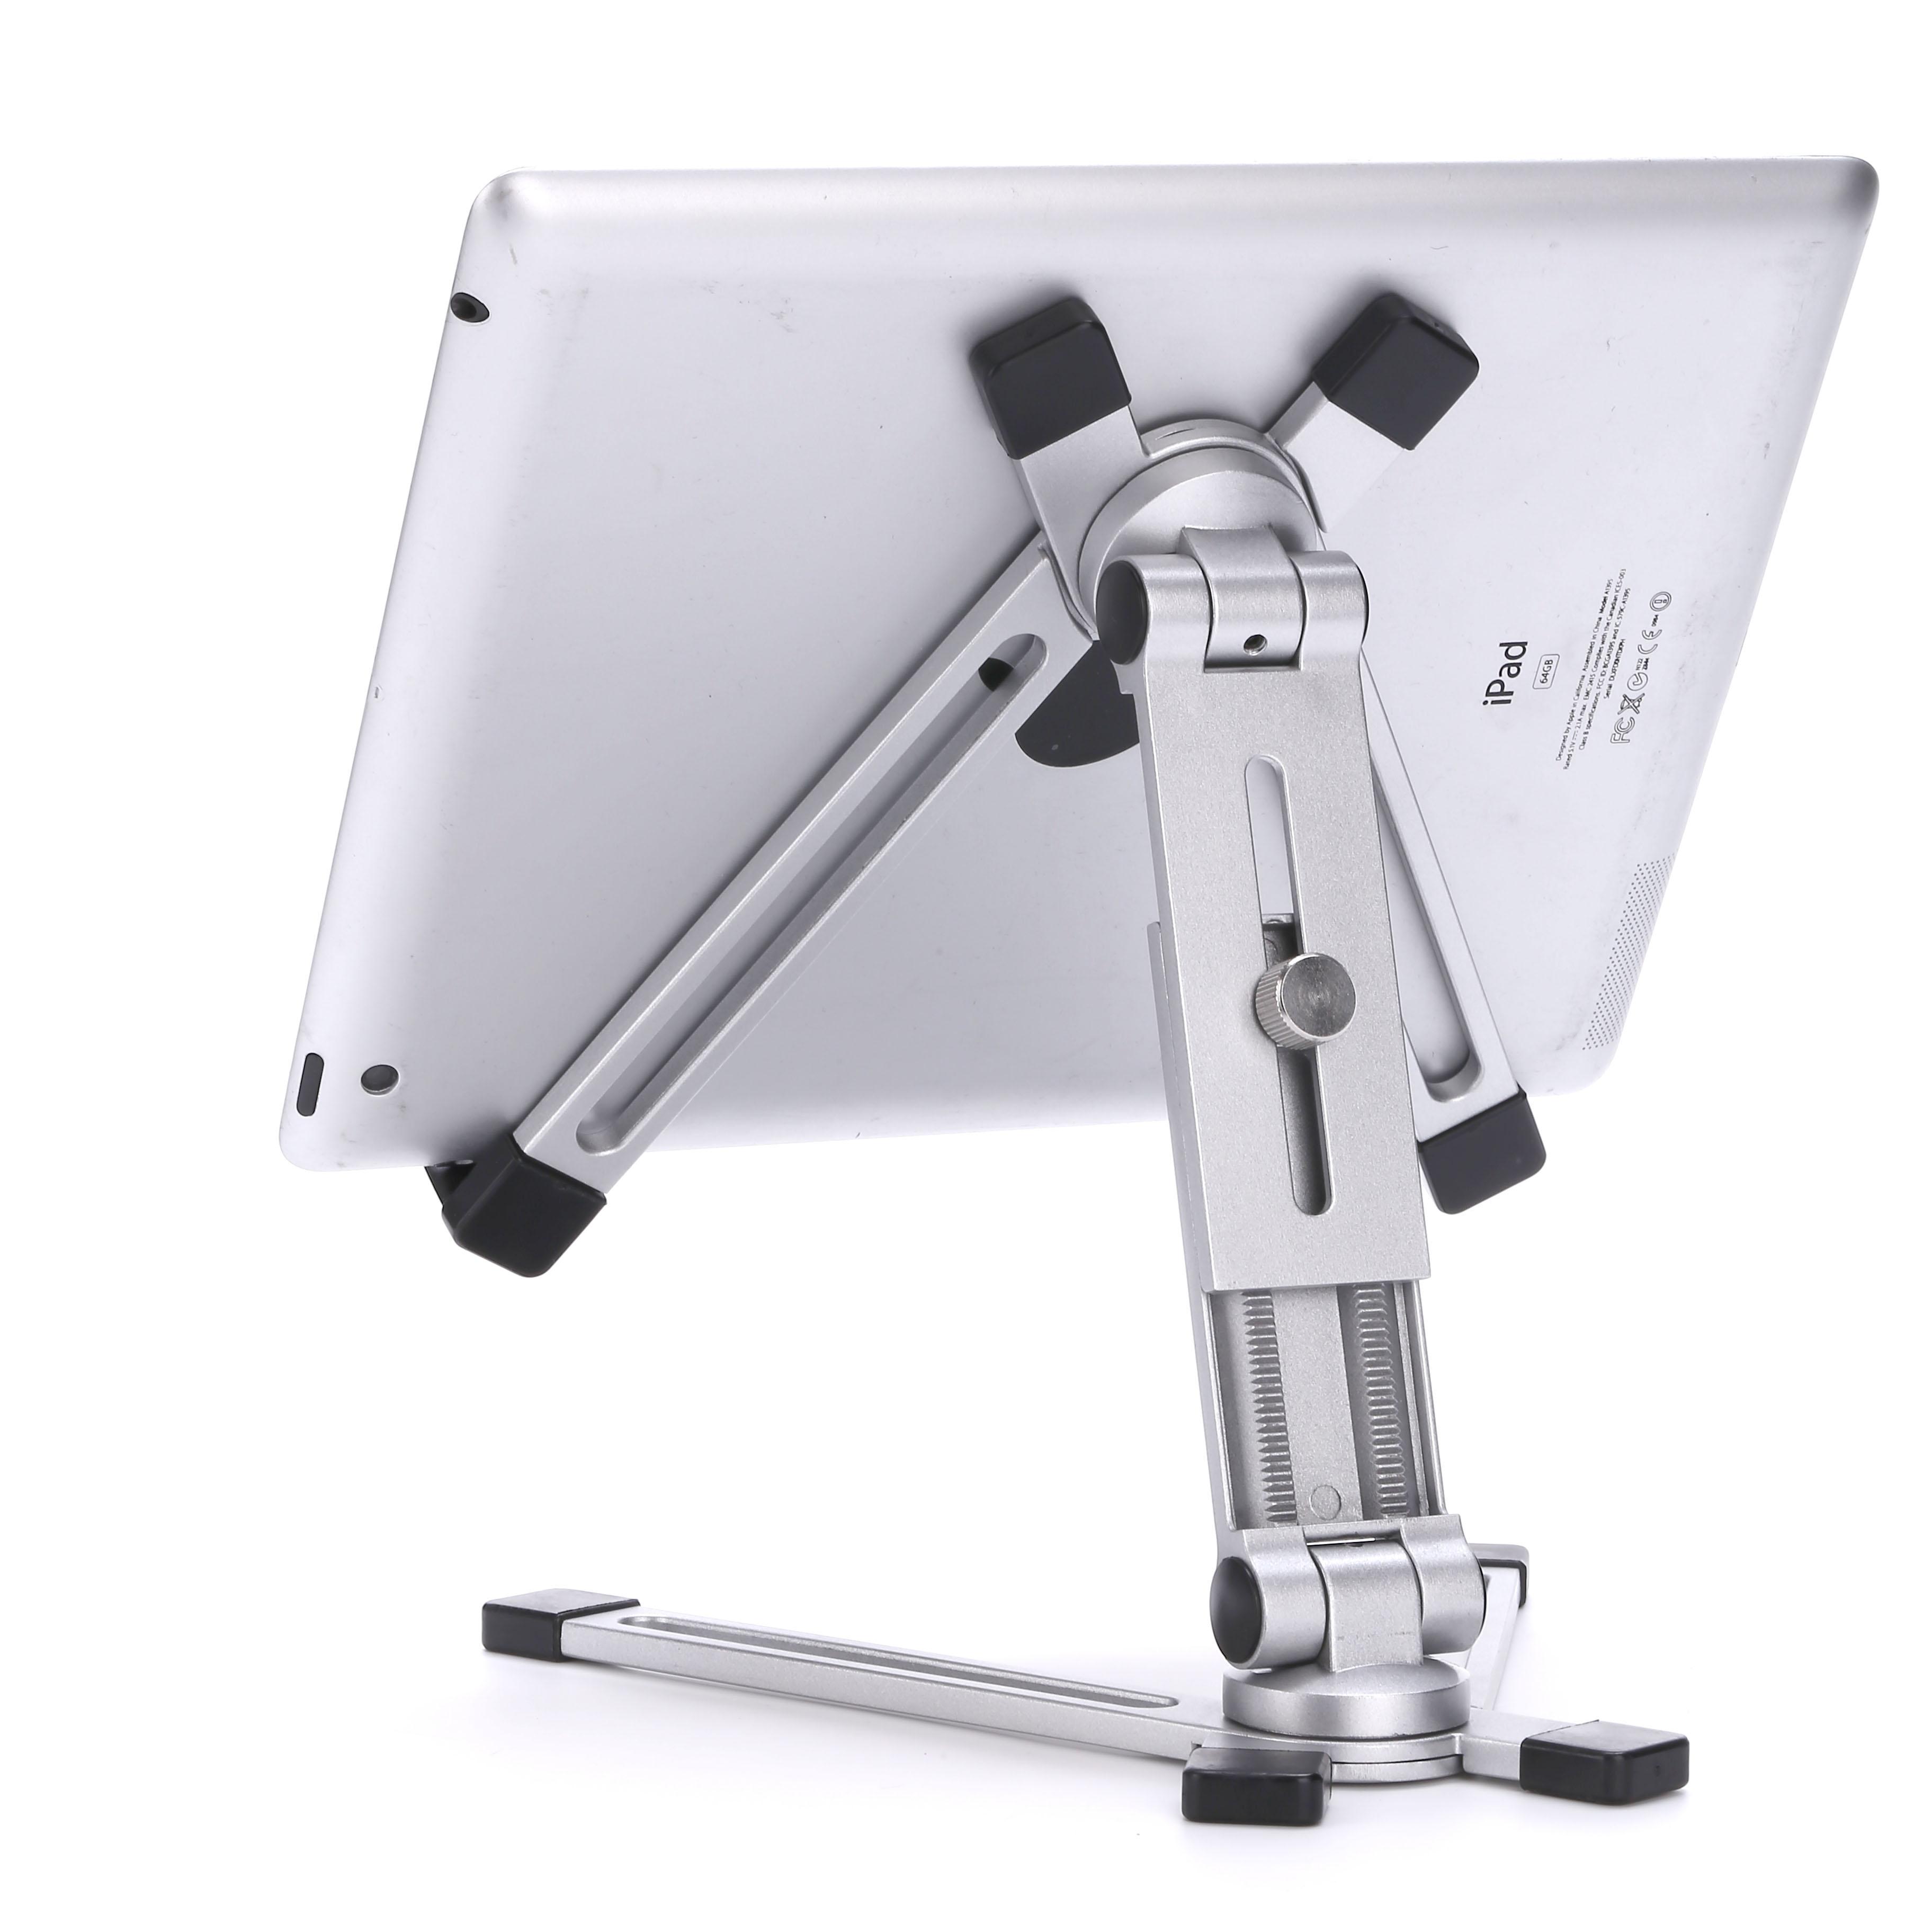 JINCOMSO金康硕铝合金笔记本电脑支架平板支架ipad支架显示器支架